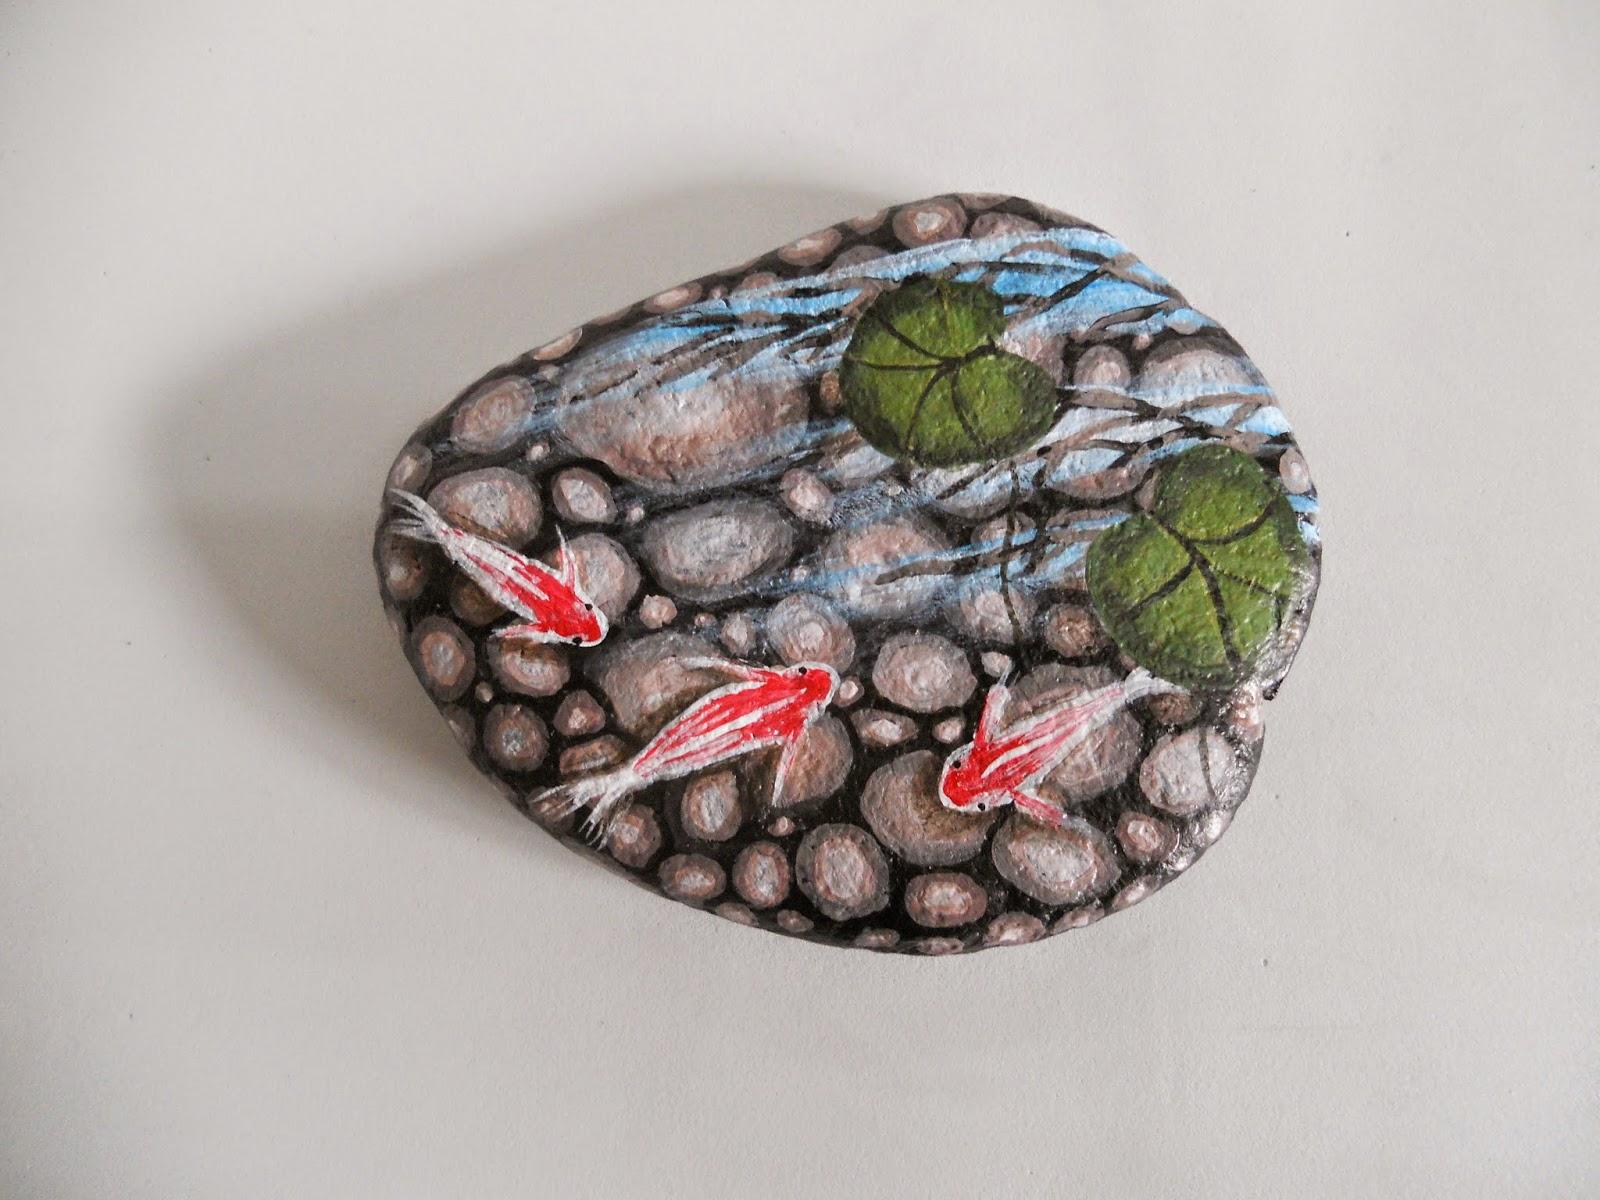 Piedras pintadas a mano carpas koi en estanque for Mano mano carpas